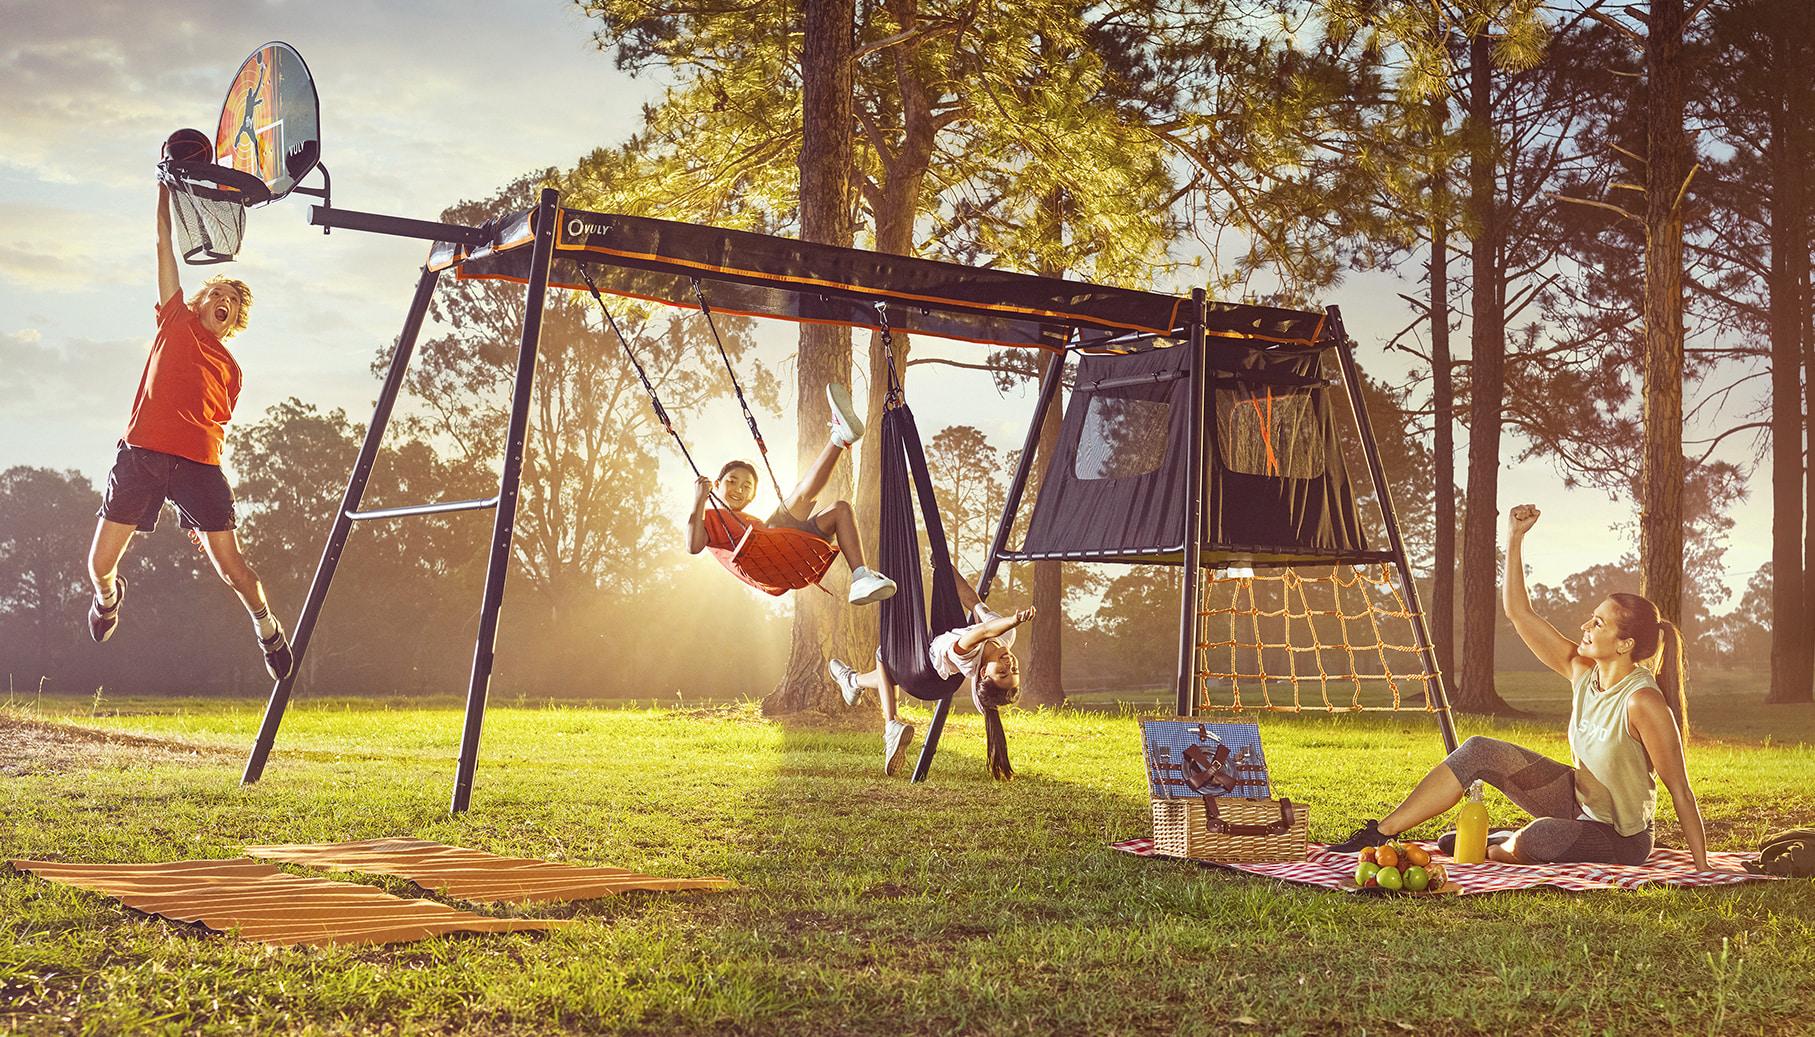 360 Yoga Swing